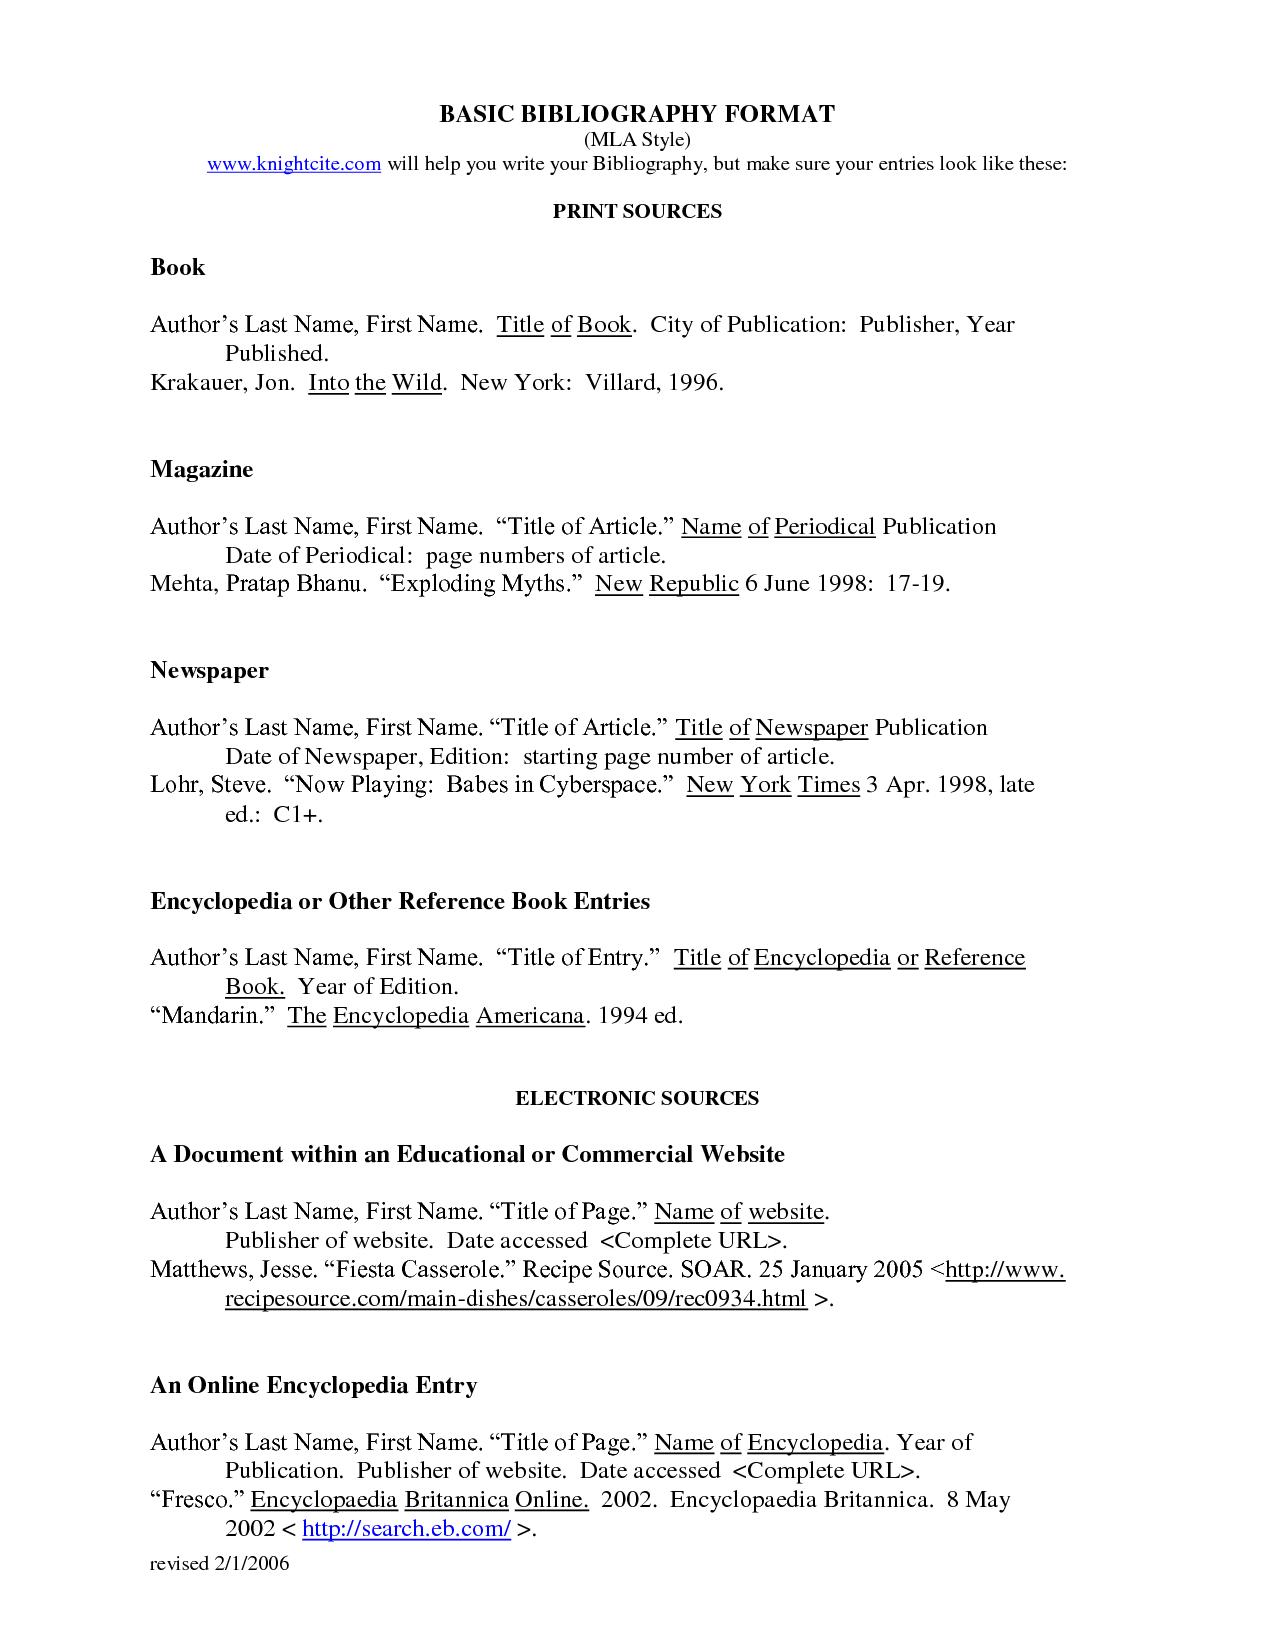 Bibliography MLA Format Works Cited  Essay tips, Works cited, Mla